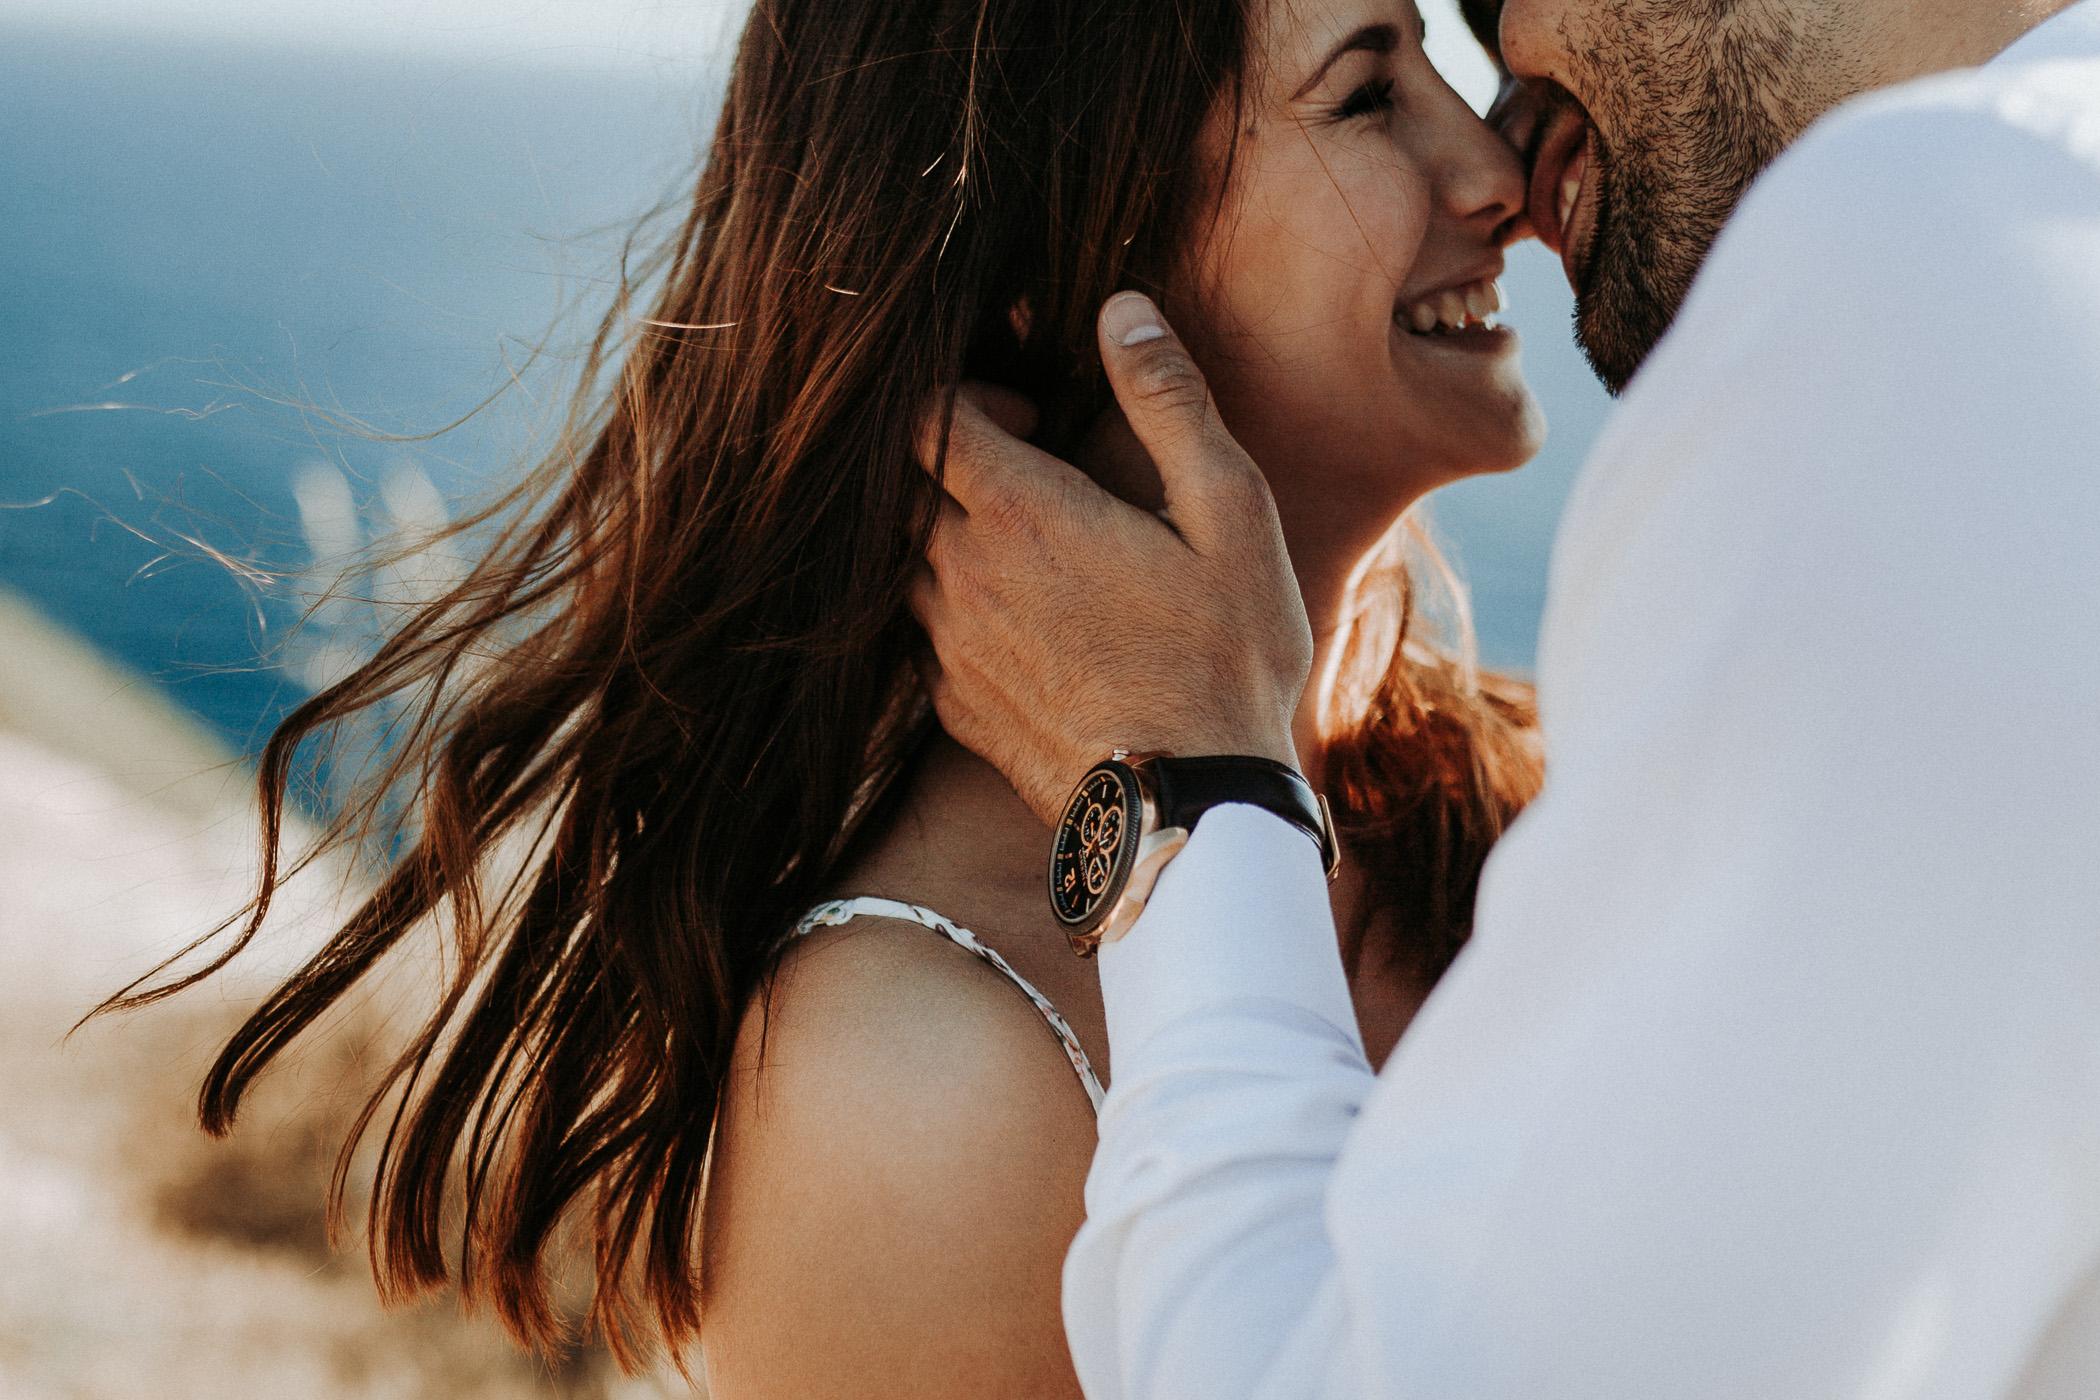 DanielaMarquardtPhotography_wedding_elopement_mallorca_spain_calapi_palma_lauraandtoni_89